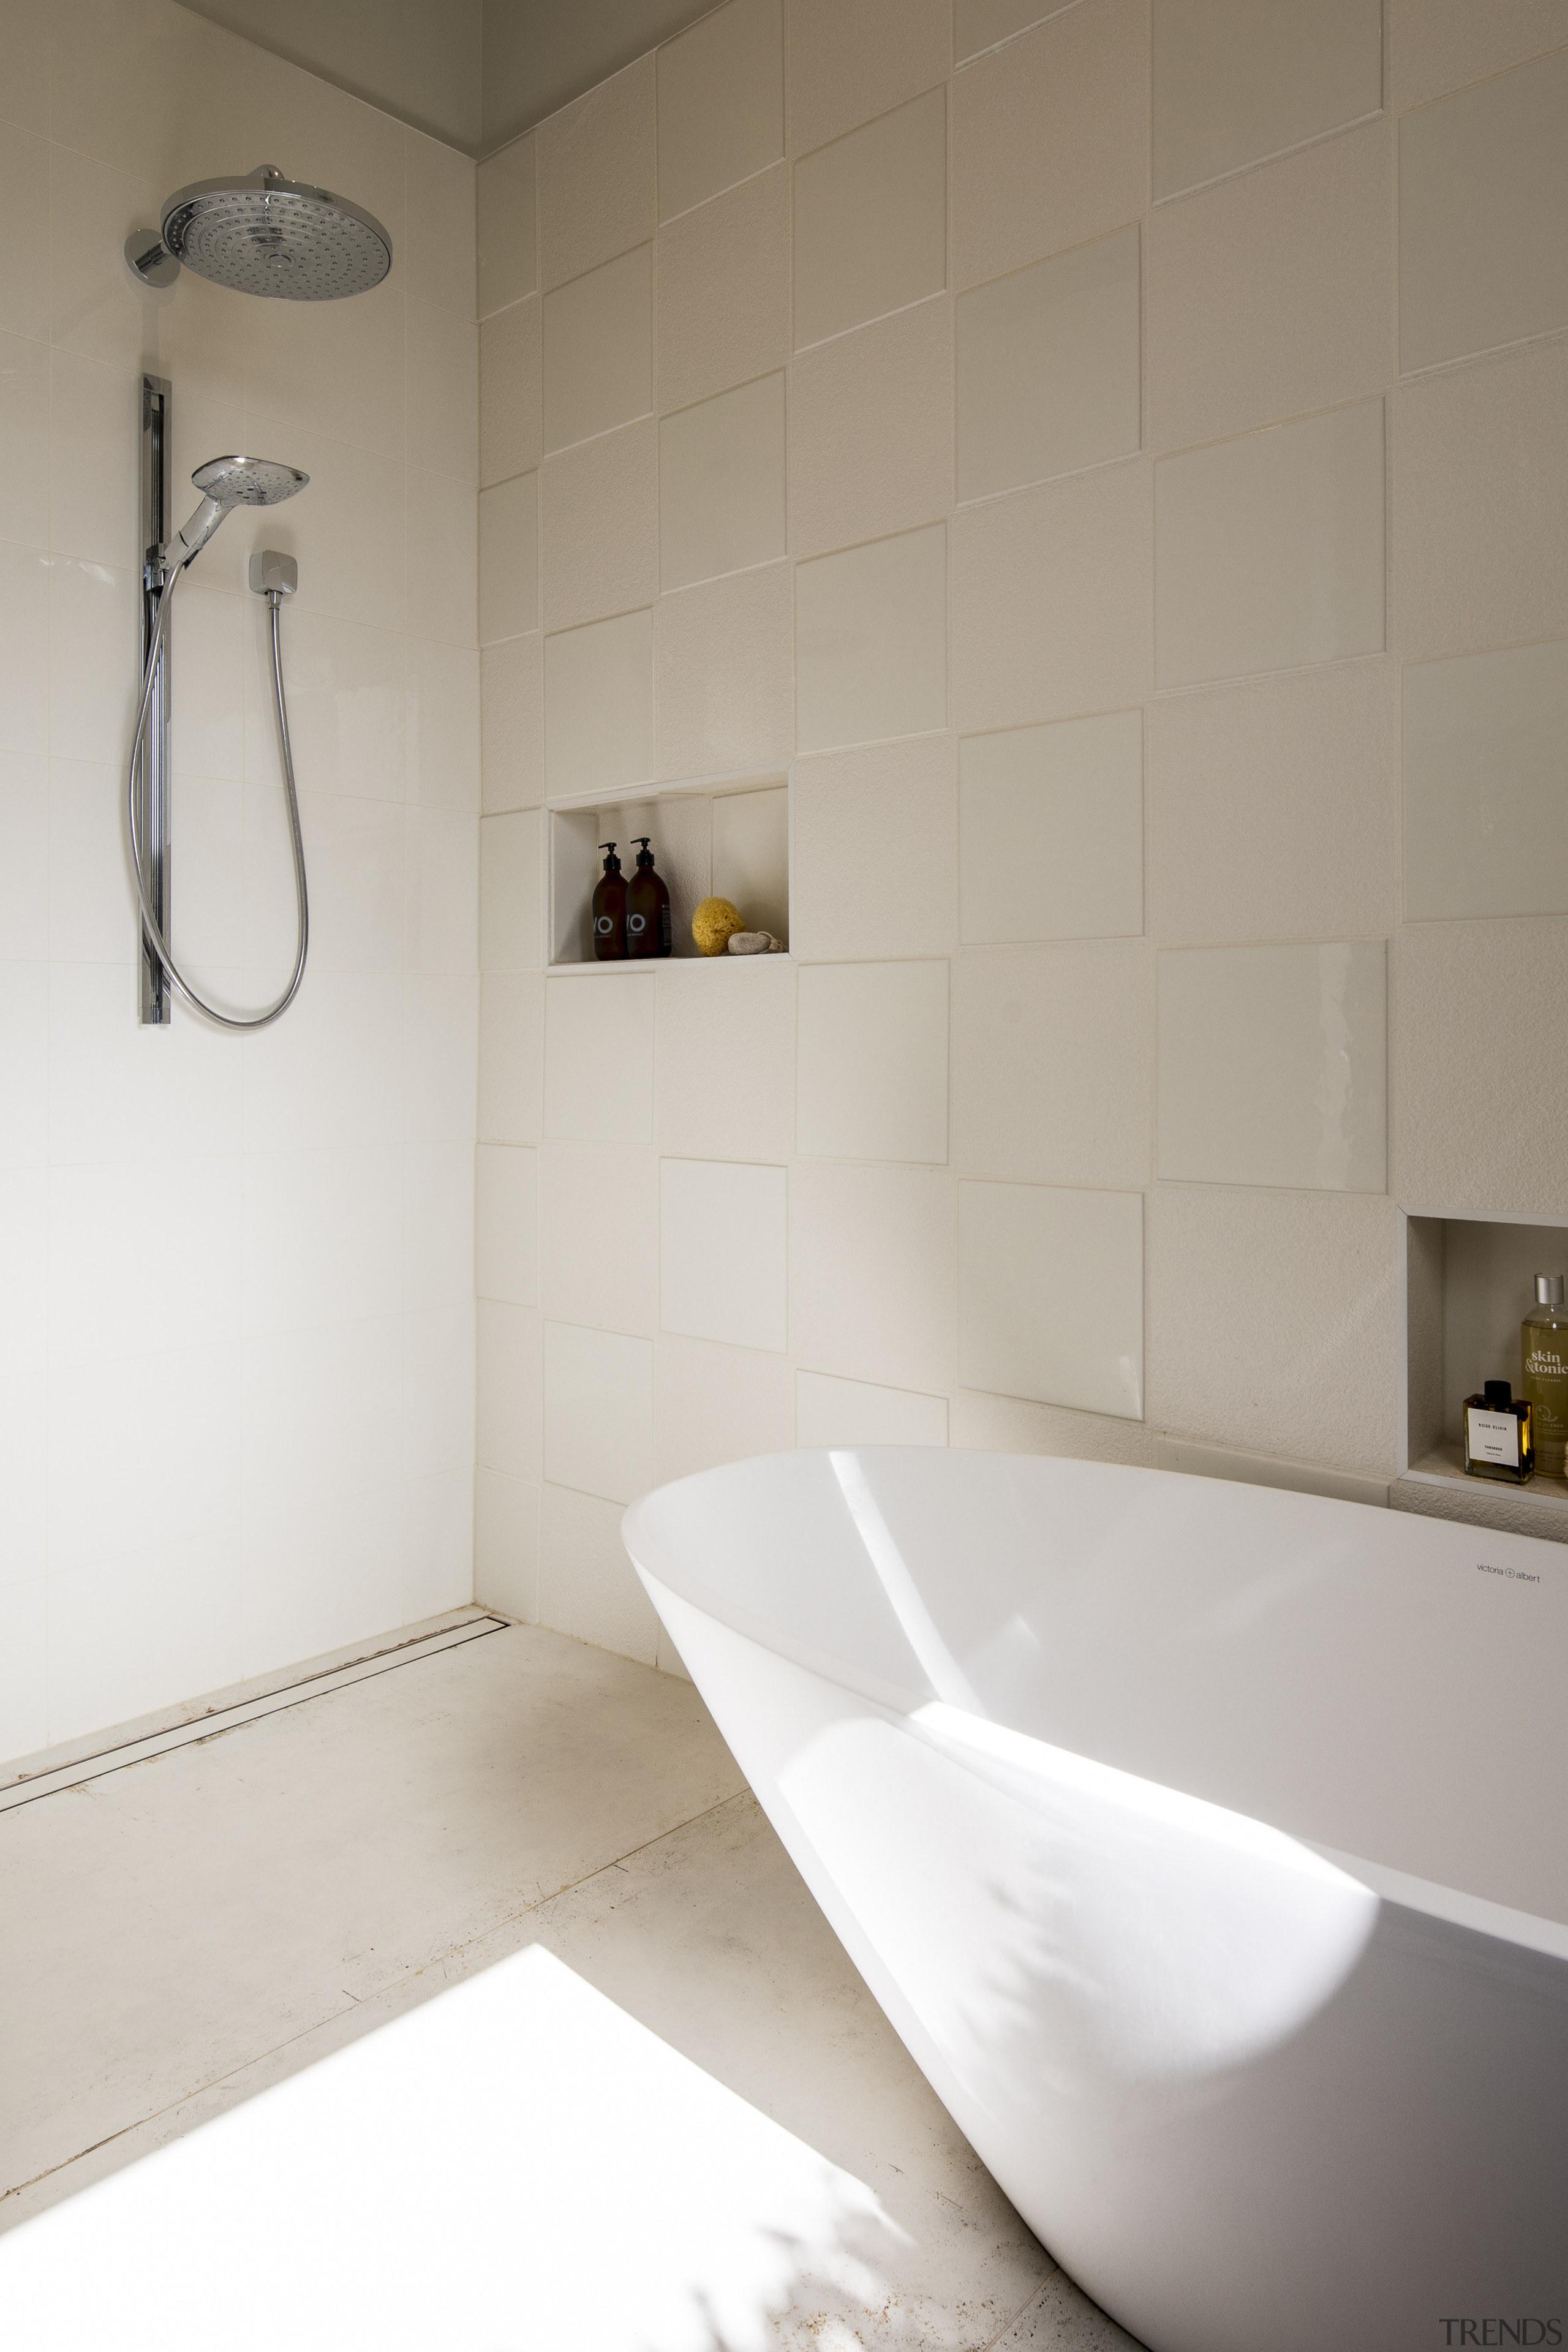 A strip drain ensures speedy drainage in the bathroom, ceramic, floor, flooring, interior design, plumbing fixture, product design, room, sink, tap, tile, wall, gray